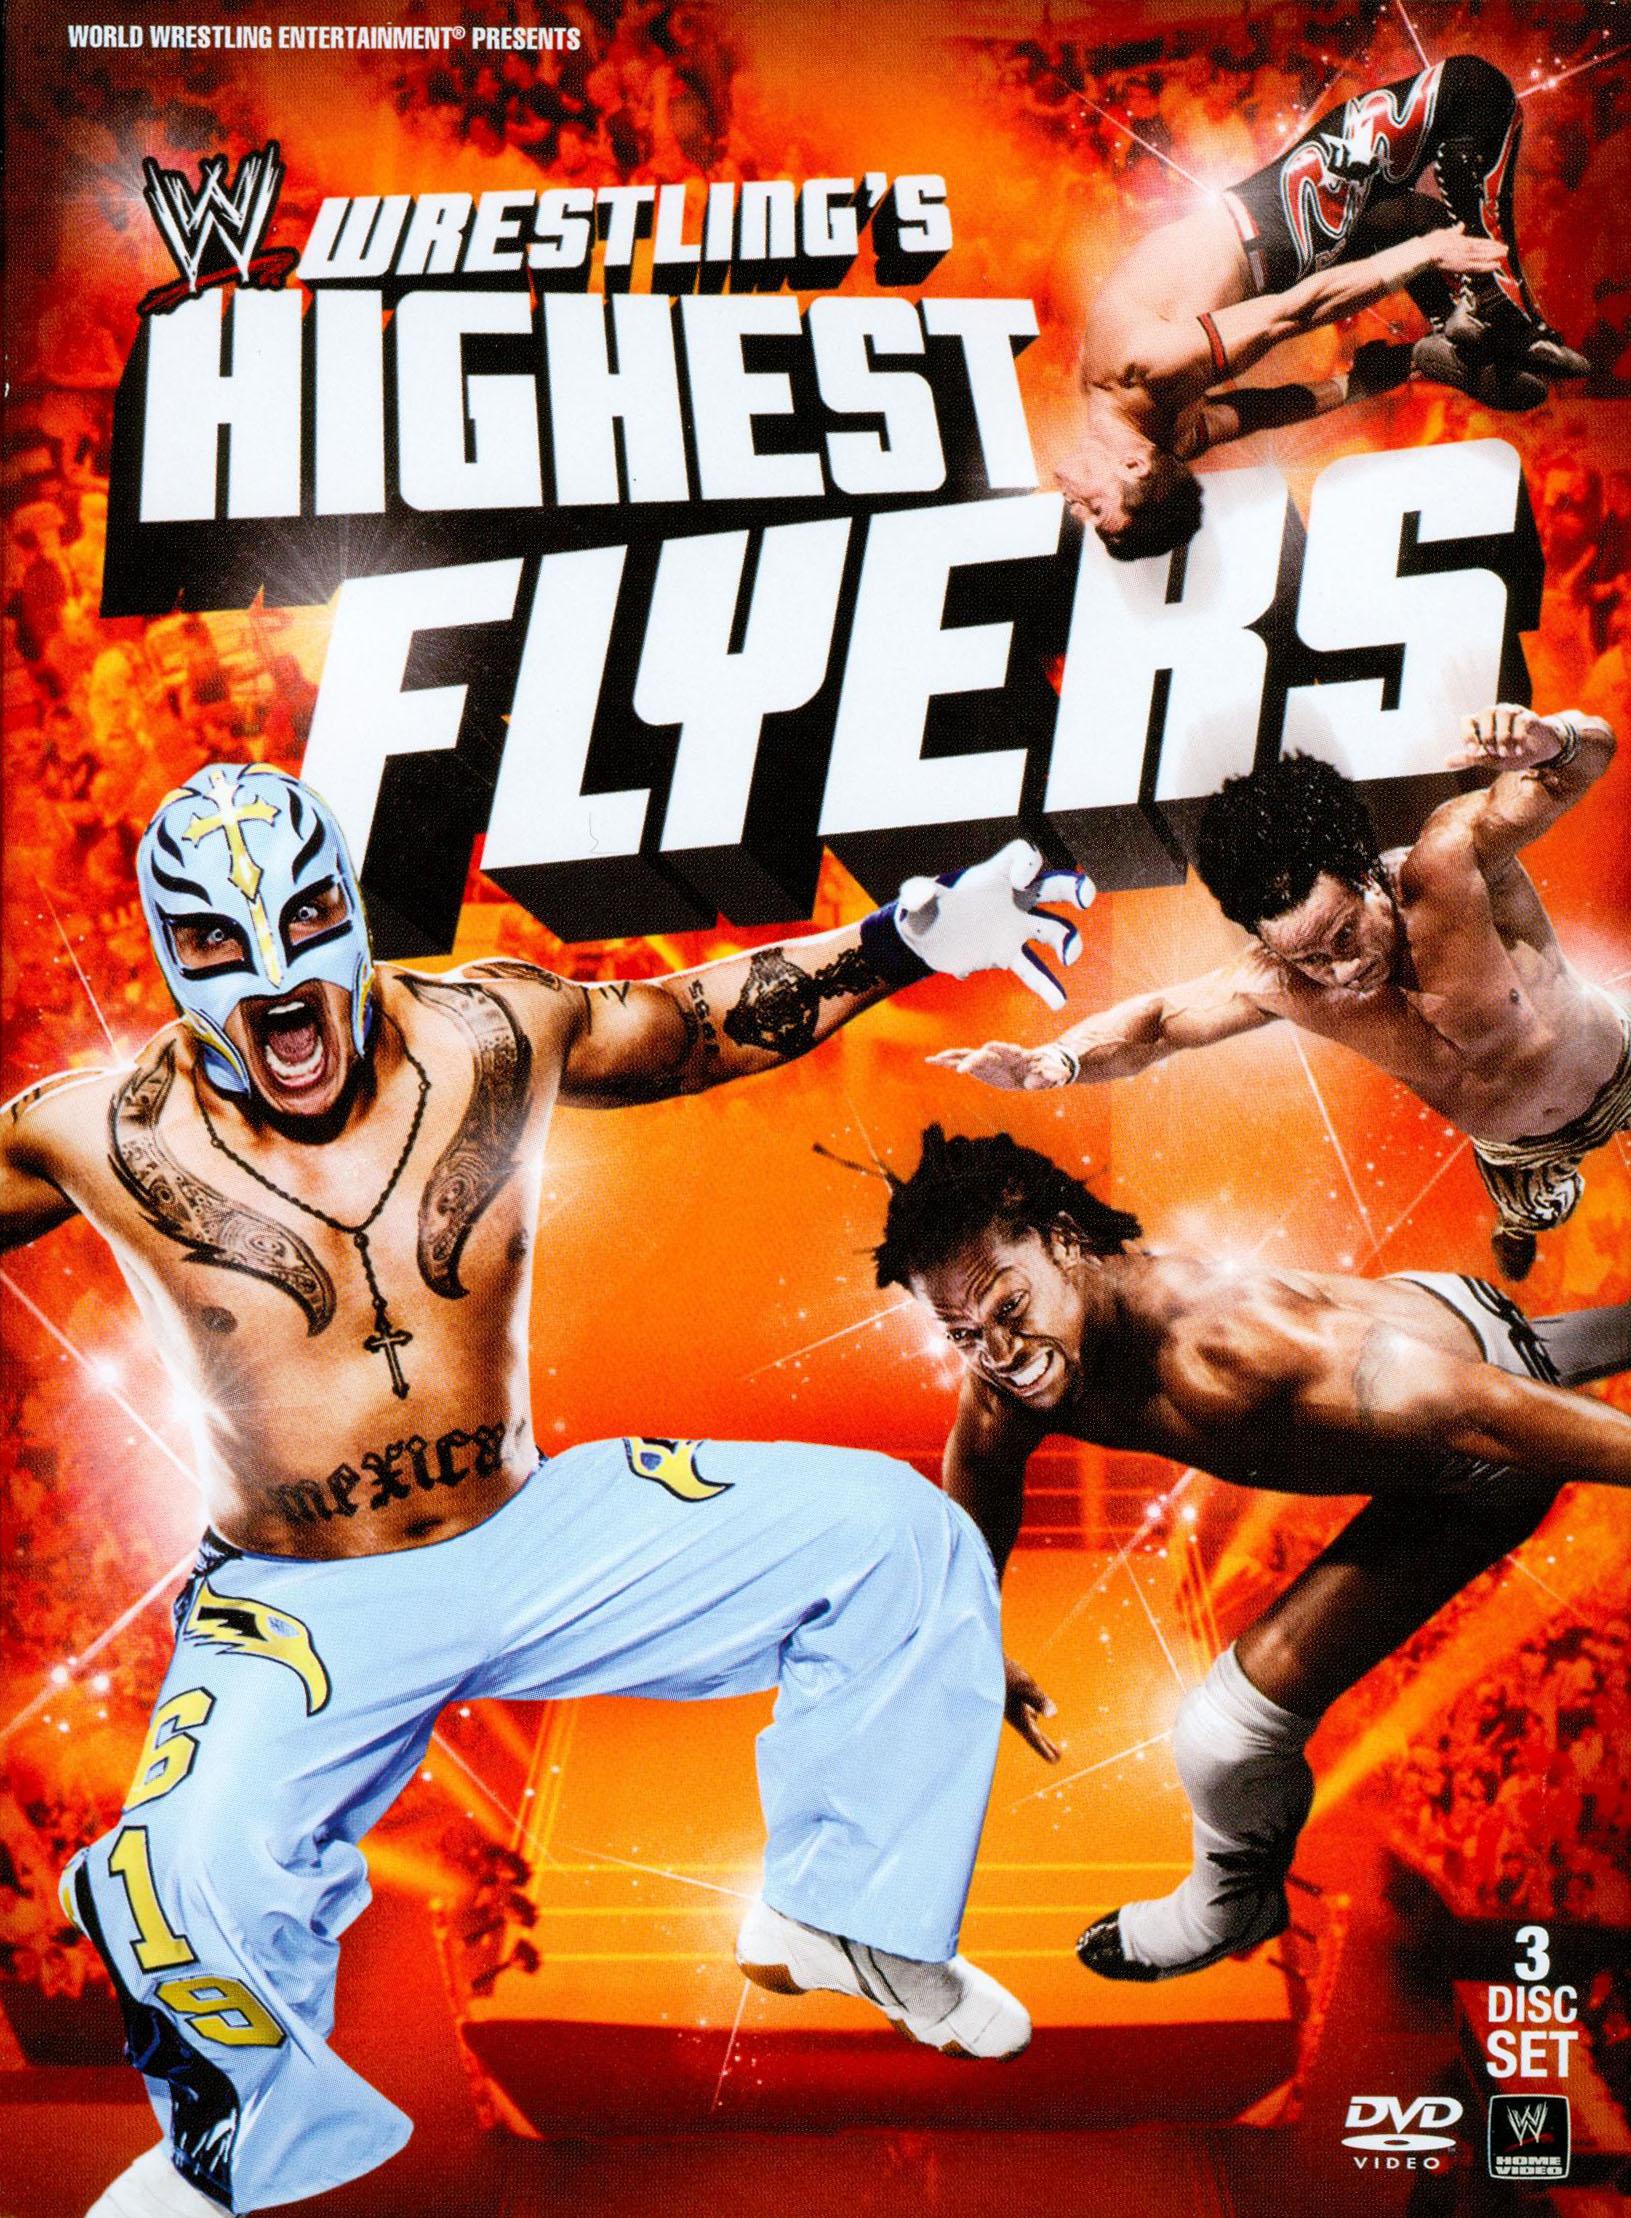 WWE: Wrestling's Highest Flyers